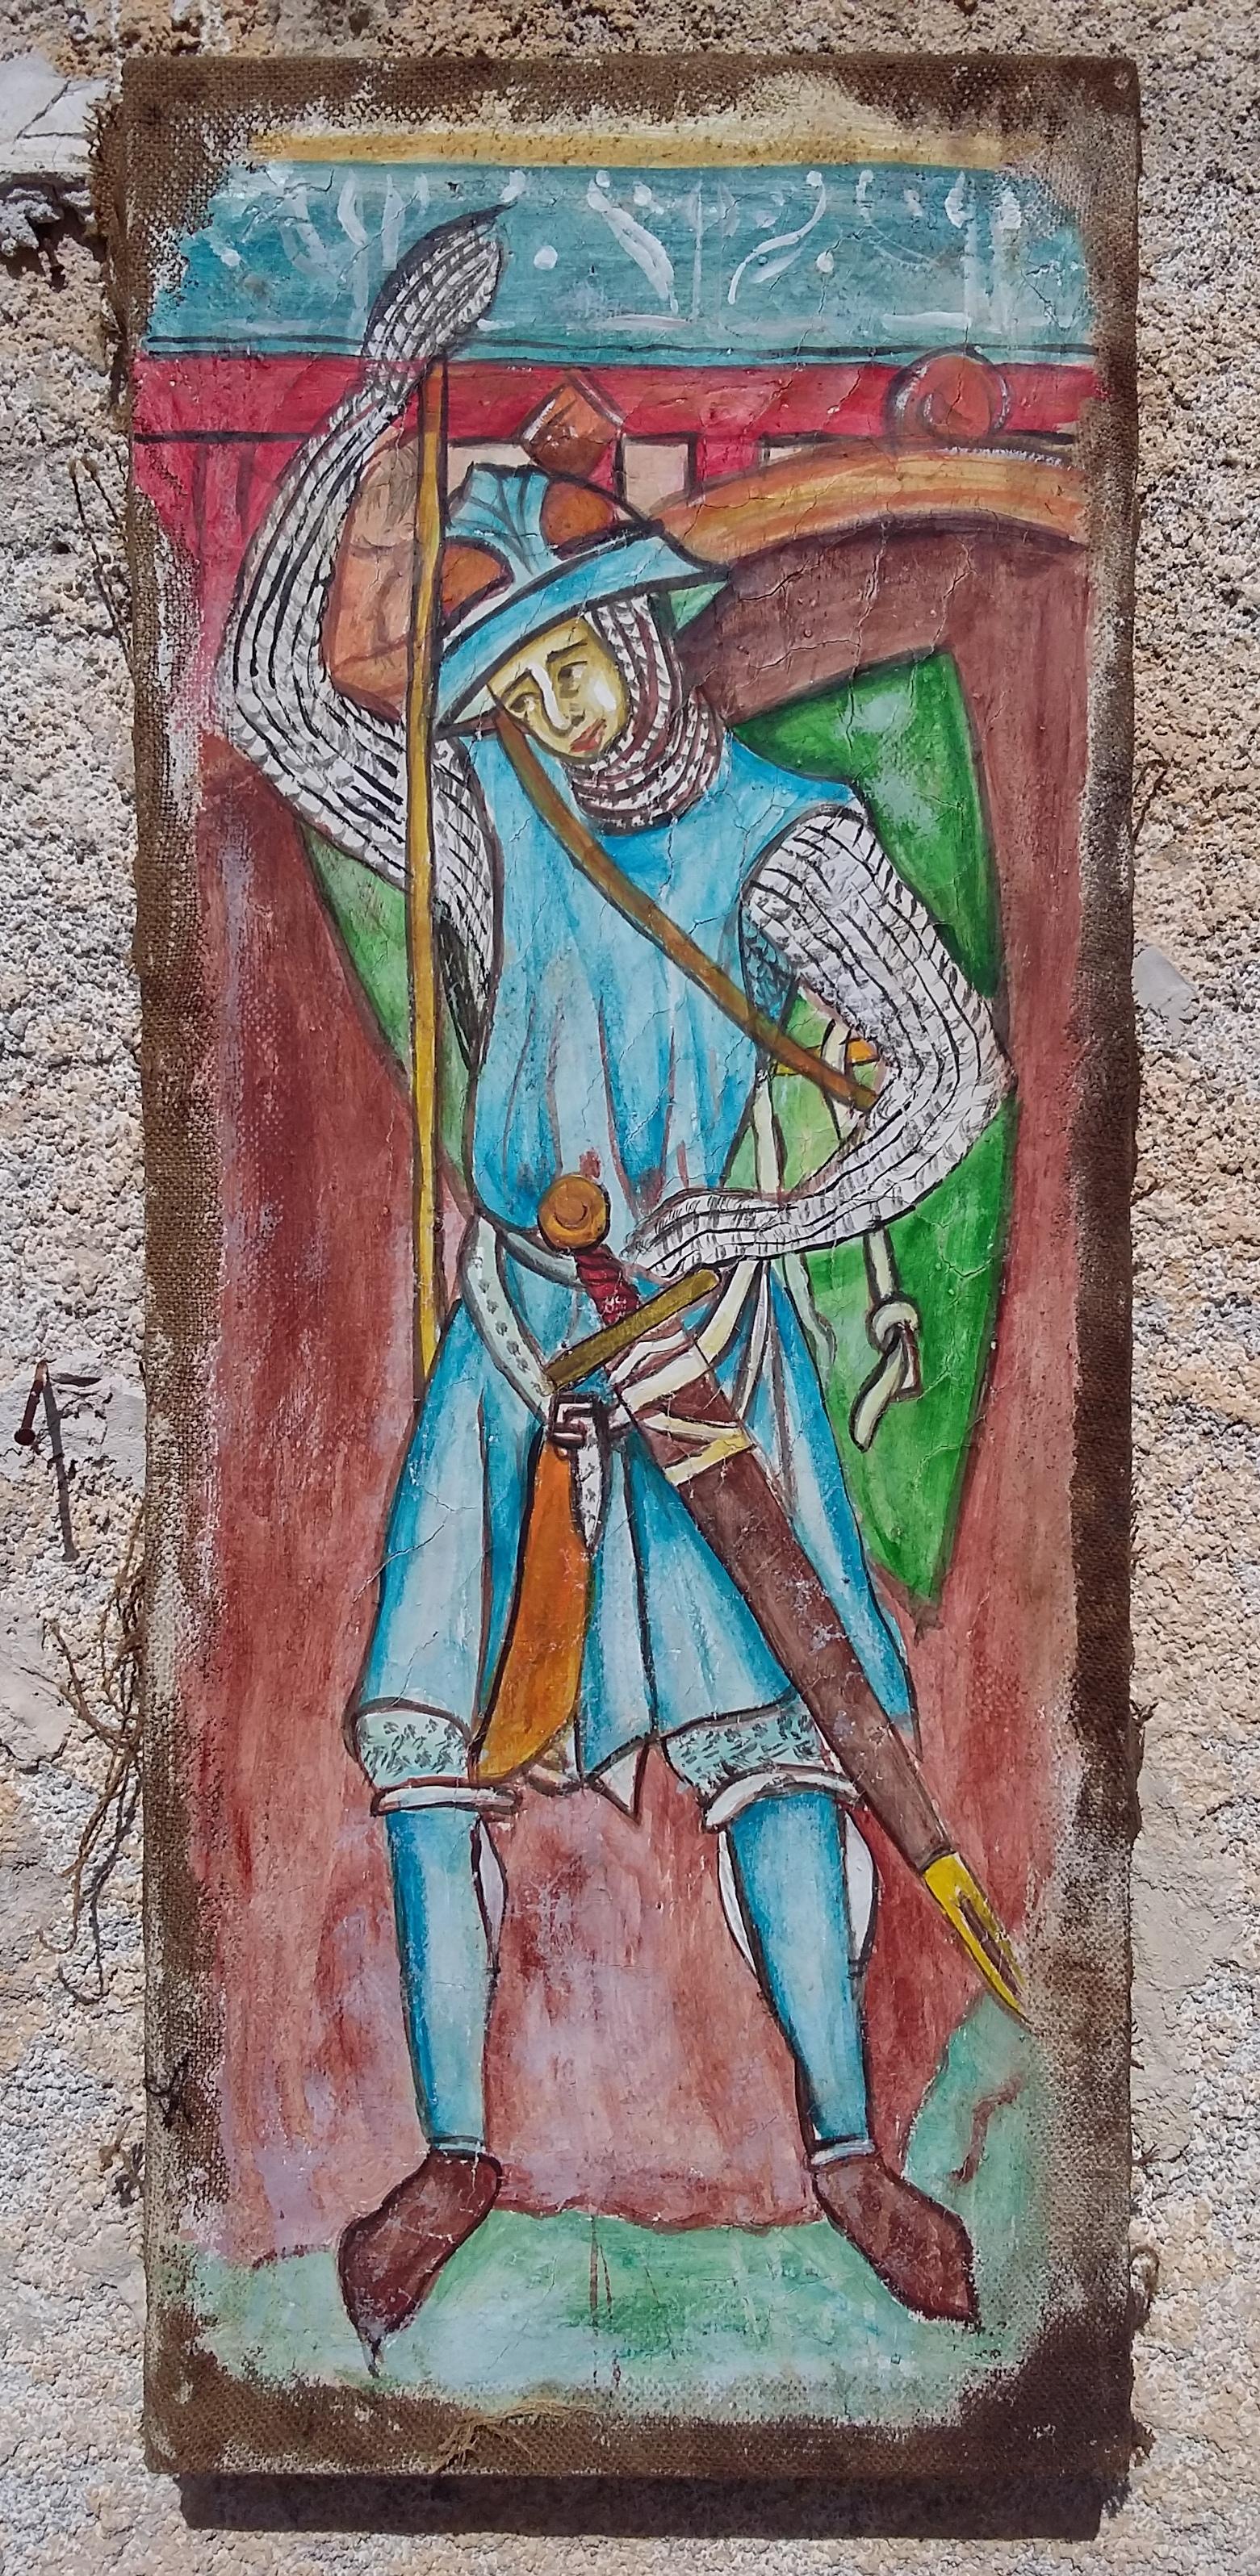 Fante Medievale